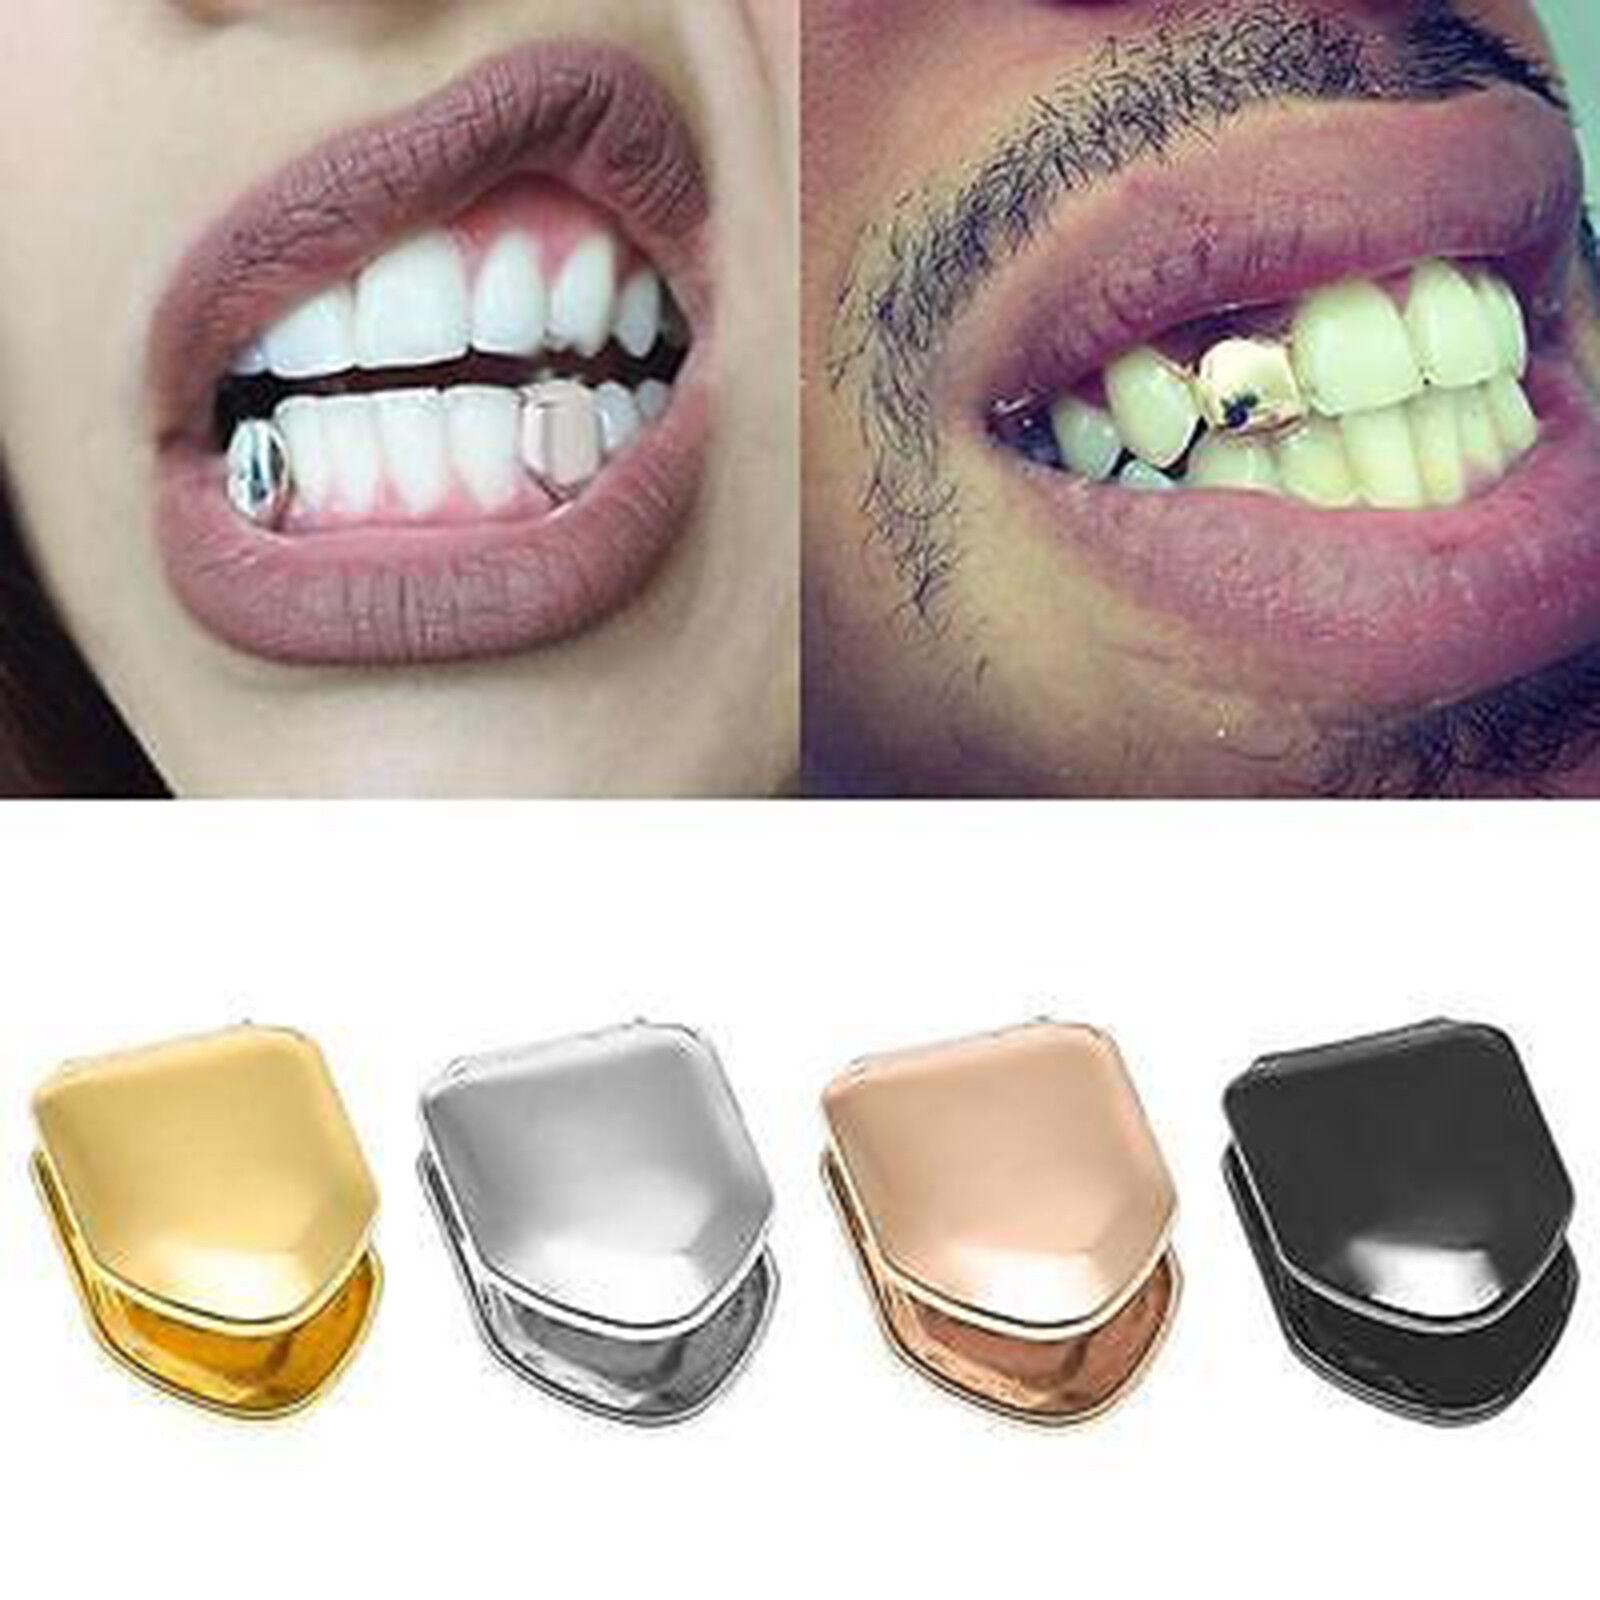 14K Gold Plated Single Tooth FANG Grill Cap Canine Teeth Hip Hop Custom  GRILLZ dd7bba9e4